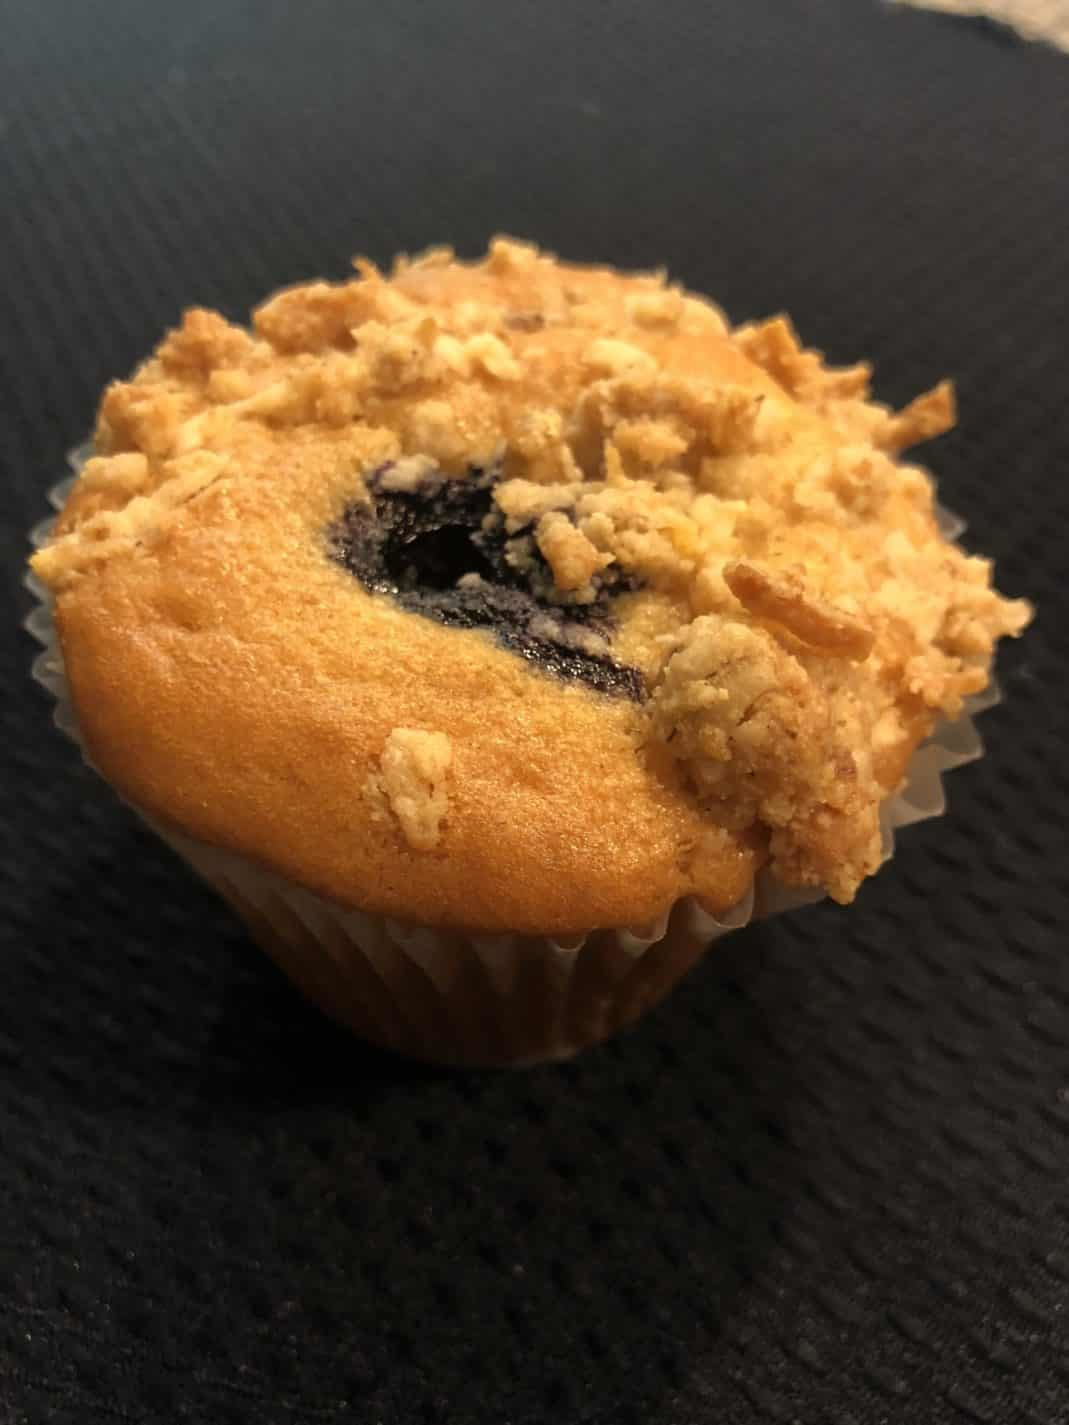 Blueberry Vegan Breakfast Muffin